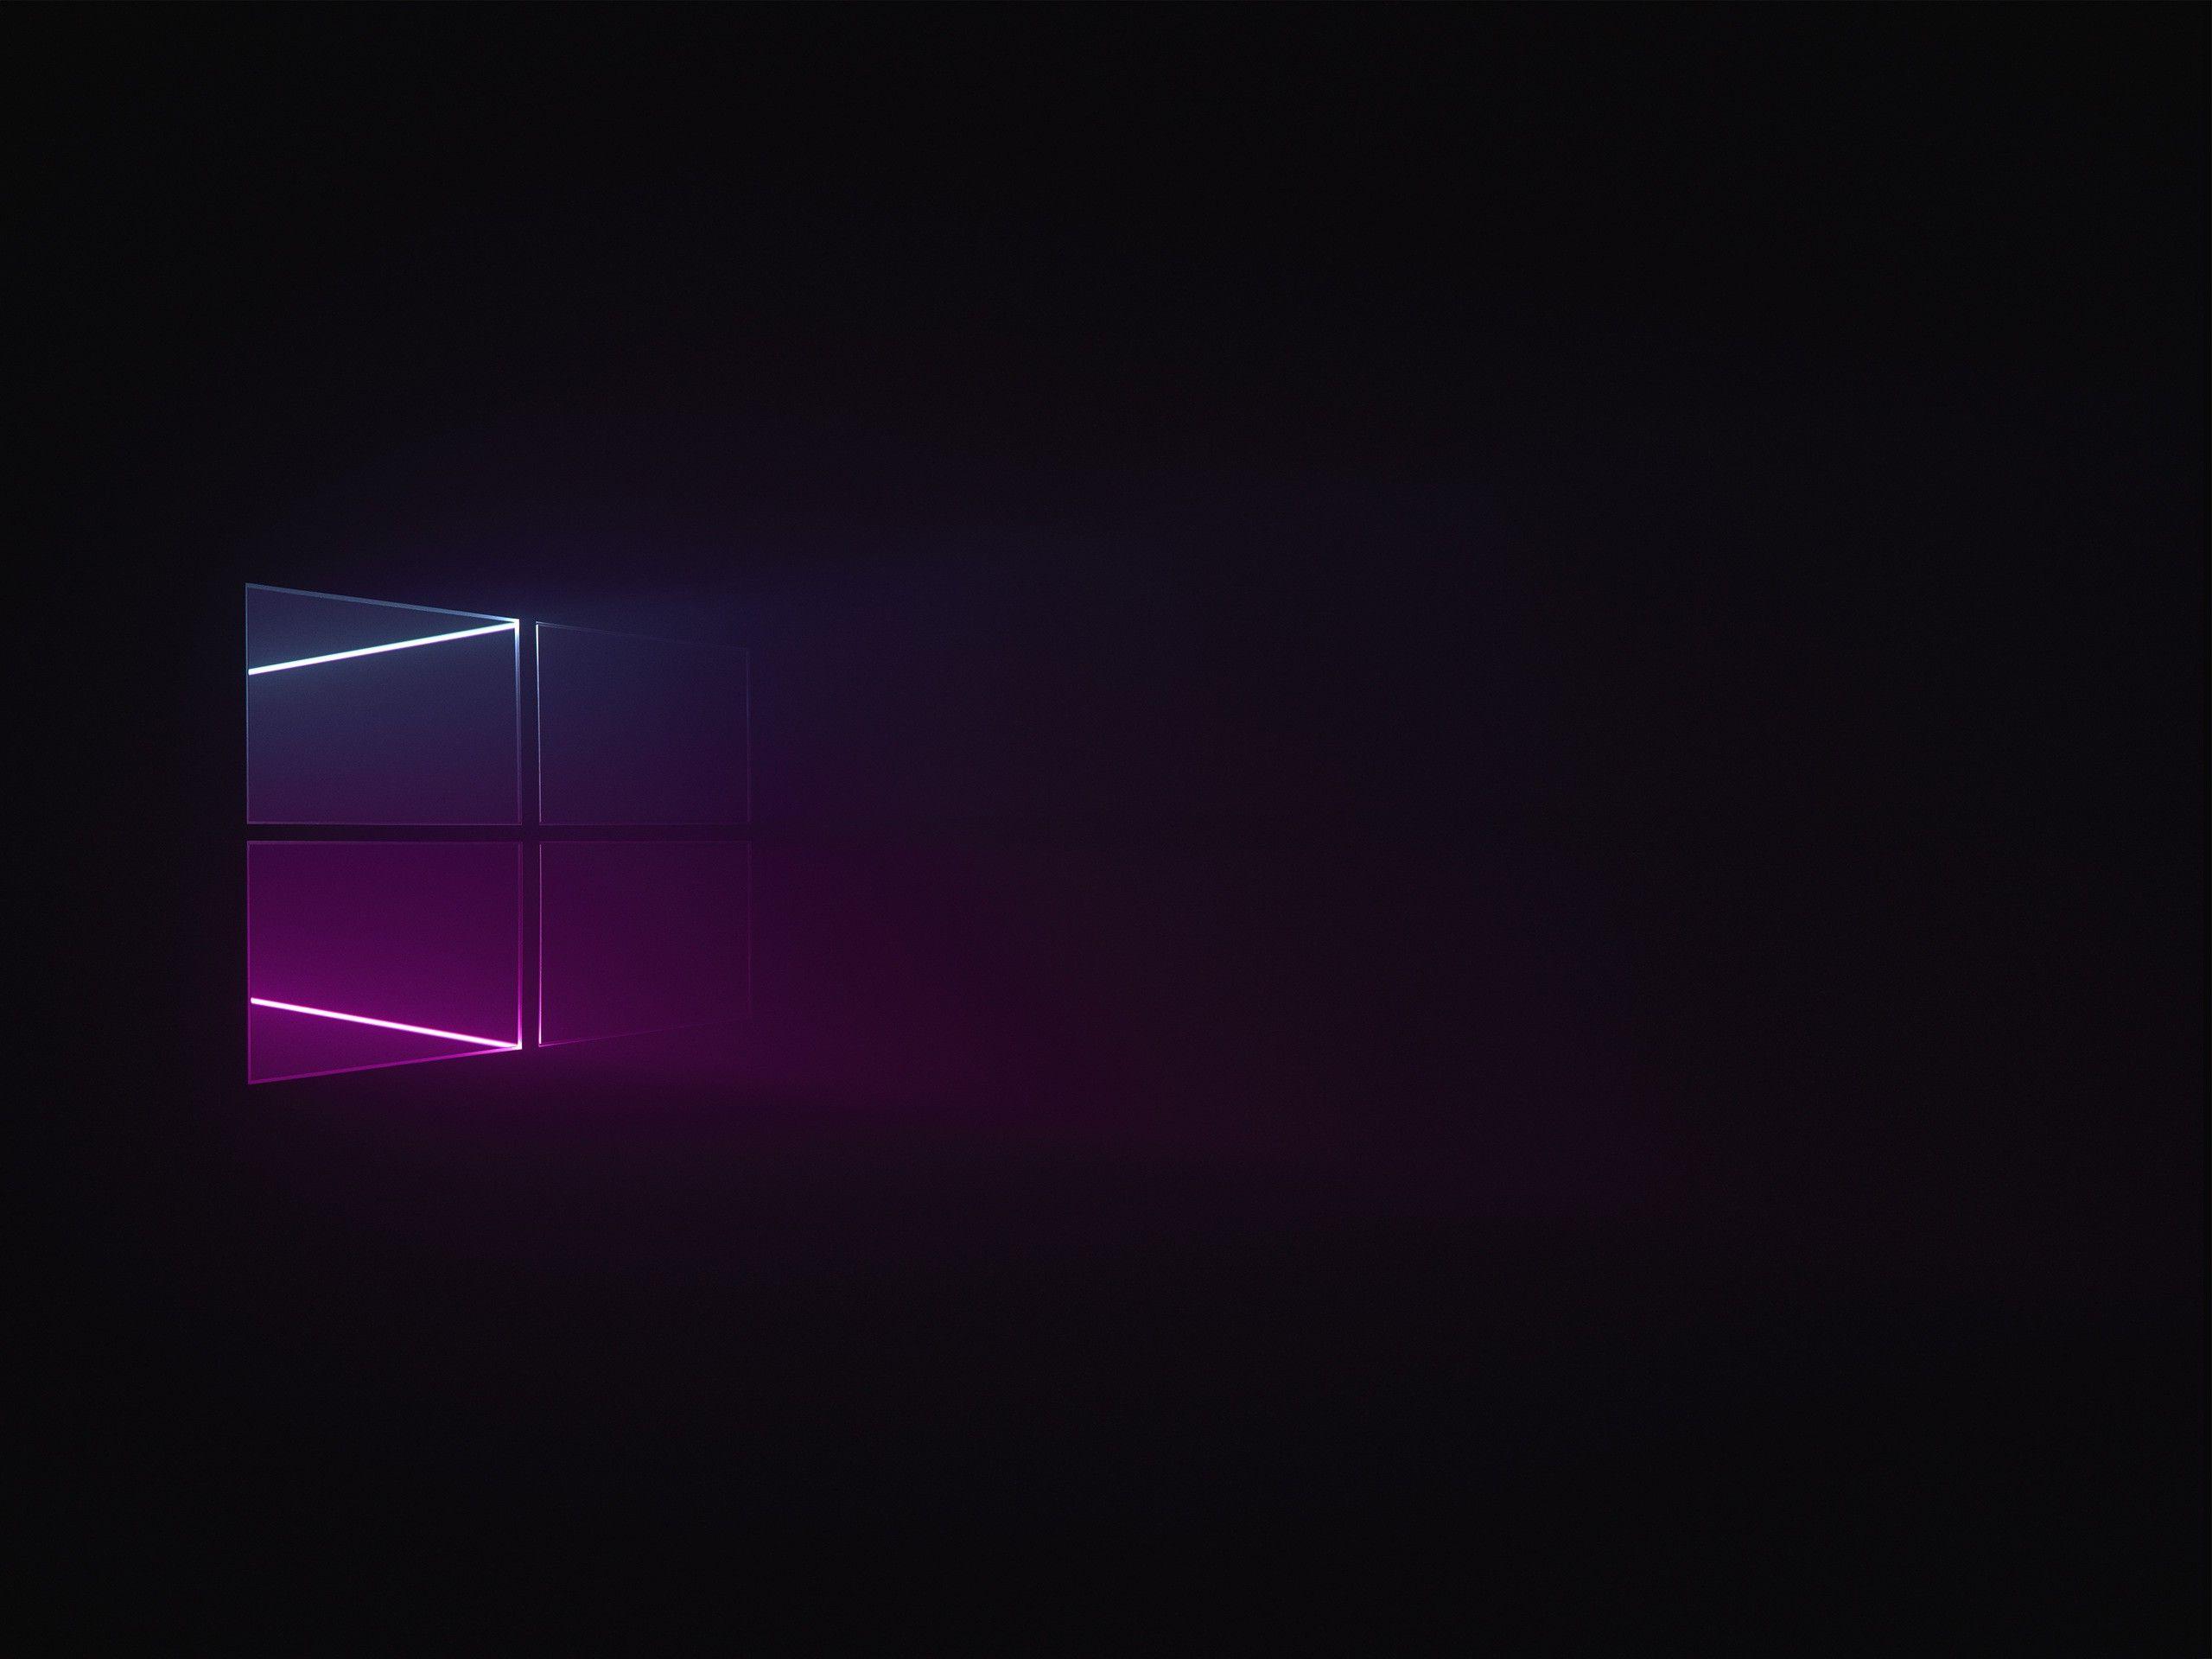 Microsoft Windows Abstract Vista Wallpapers HD Desktop